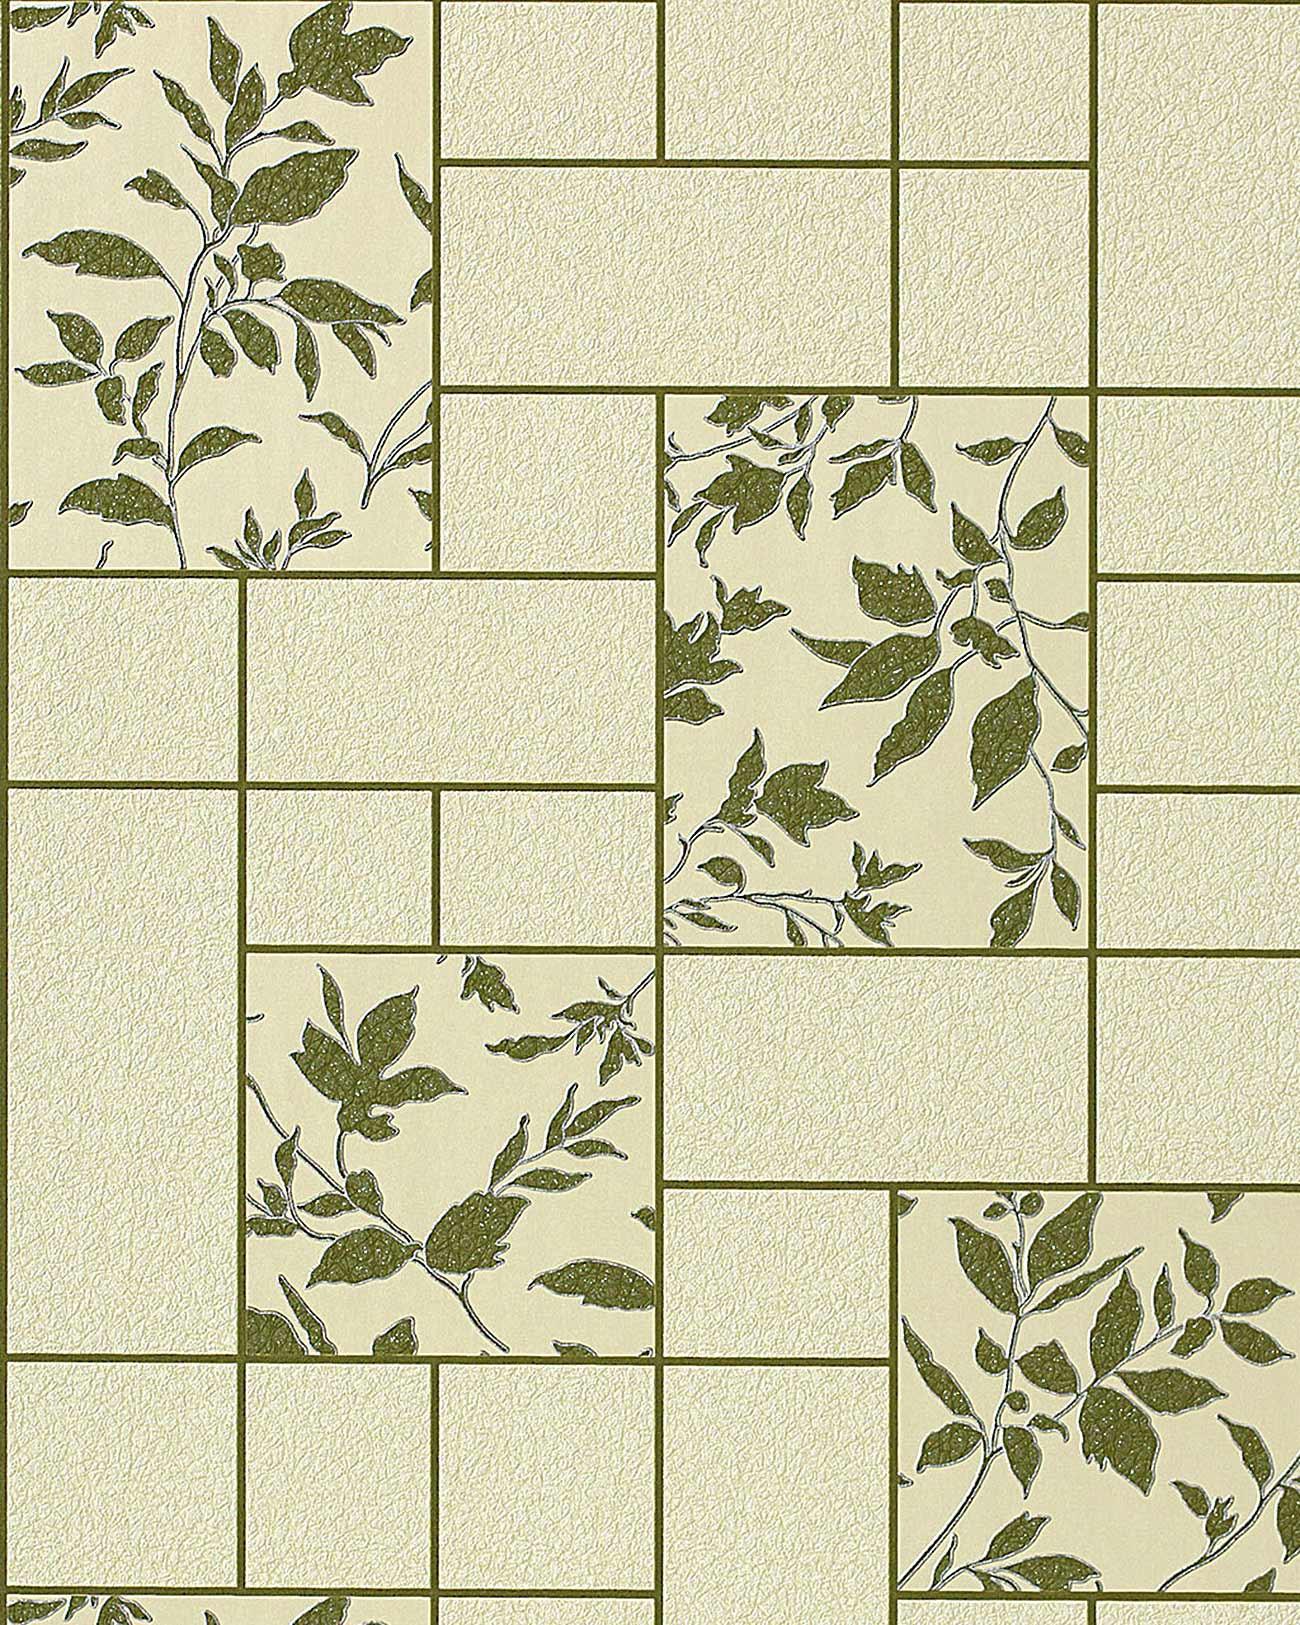 carta da parati per cucina edem 146 25 e bagno lavabile a piastrelle con fiori in verde beige verde oliva